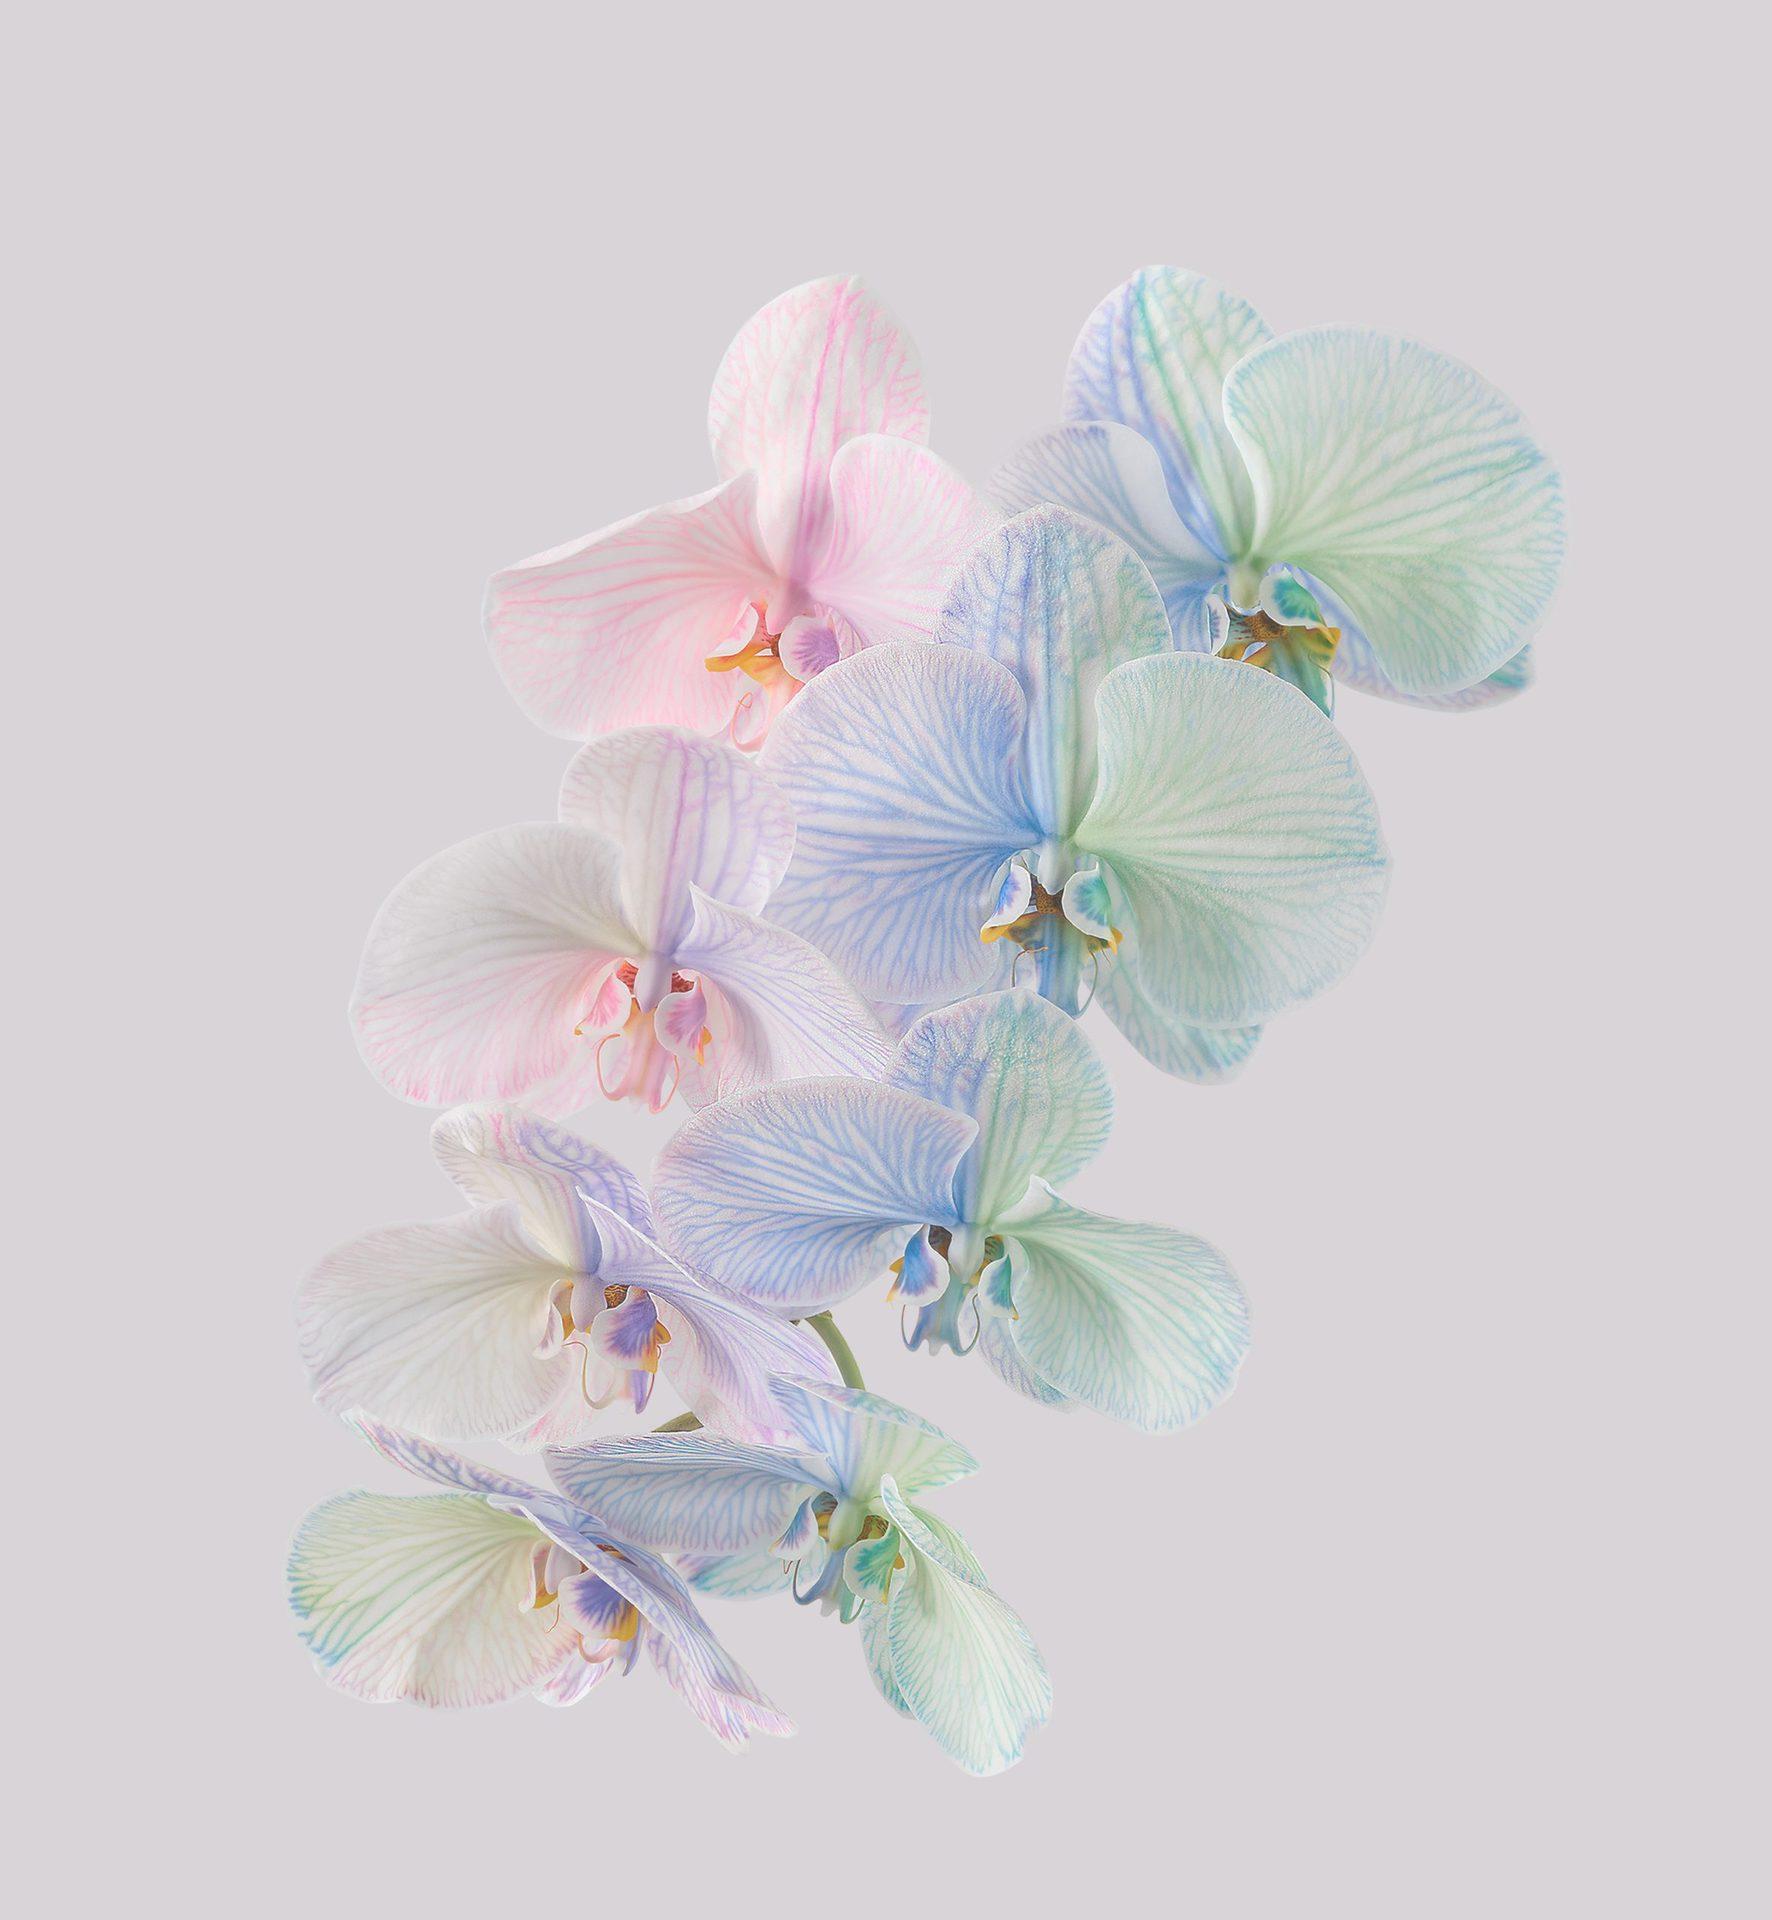 Pixel 6 Pro Wallpaper Moth Orchid light by Andrew Zuckerman